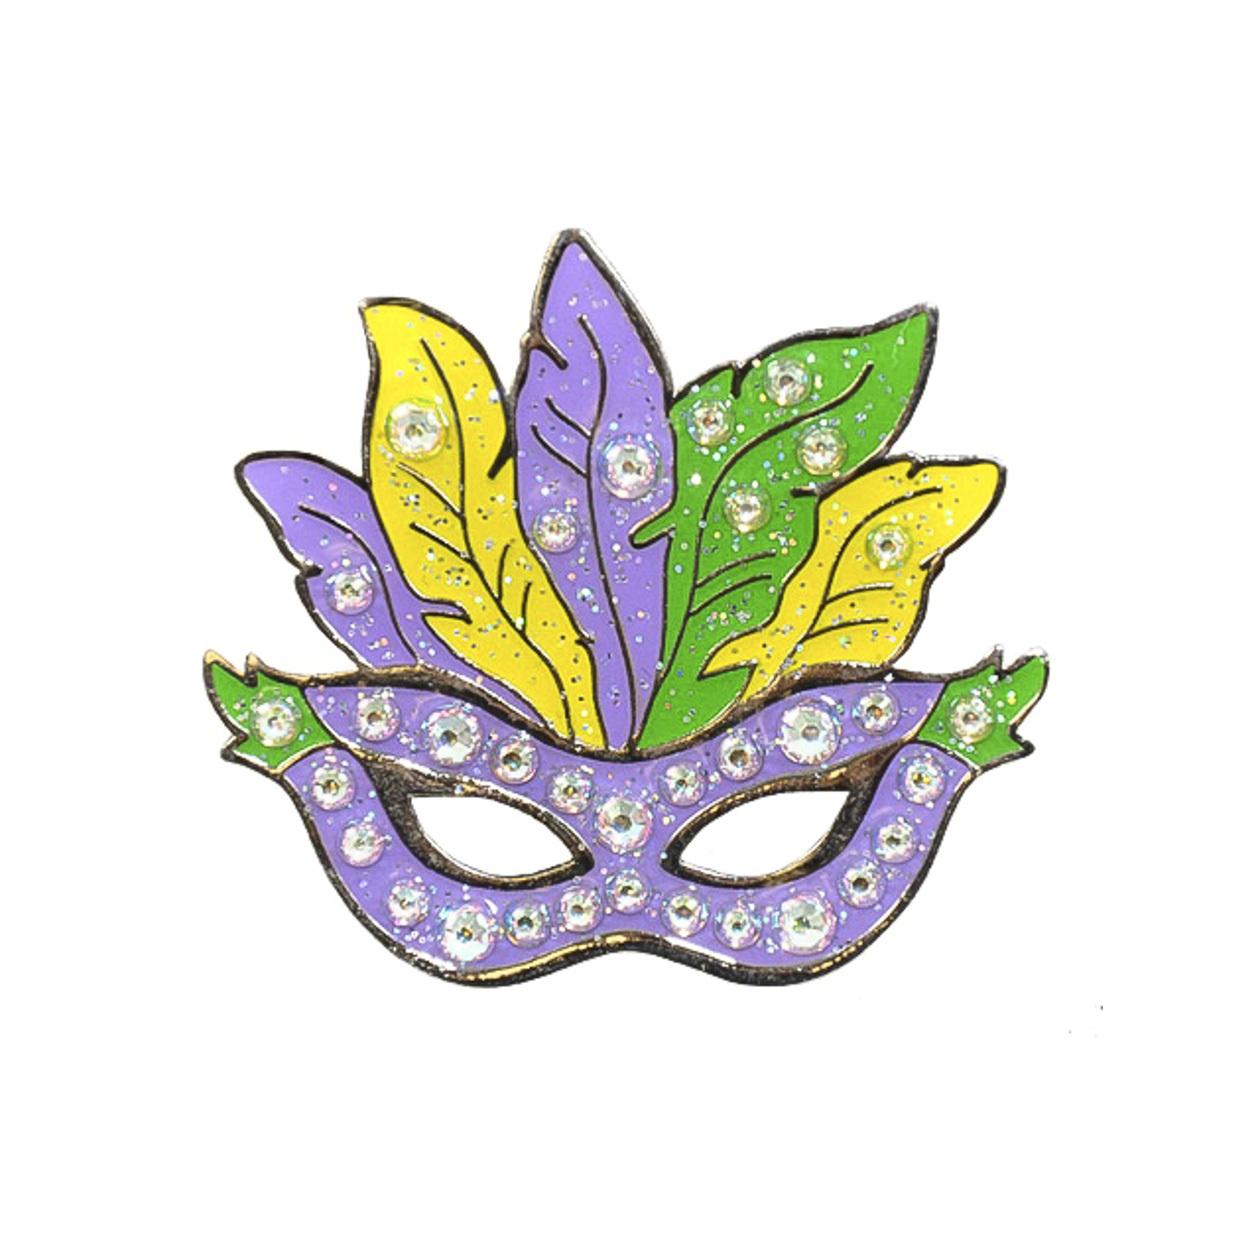 138. Mardi Gras Mask